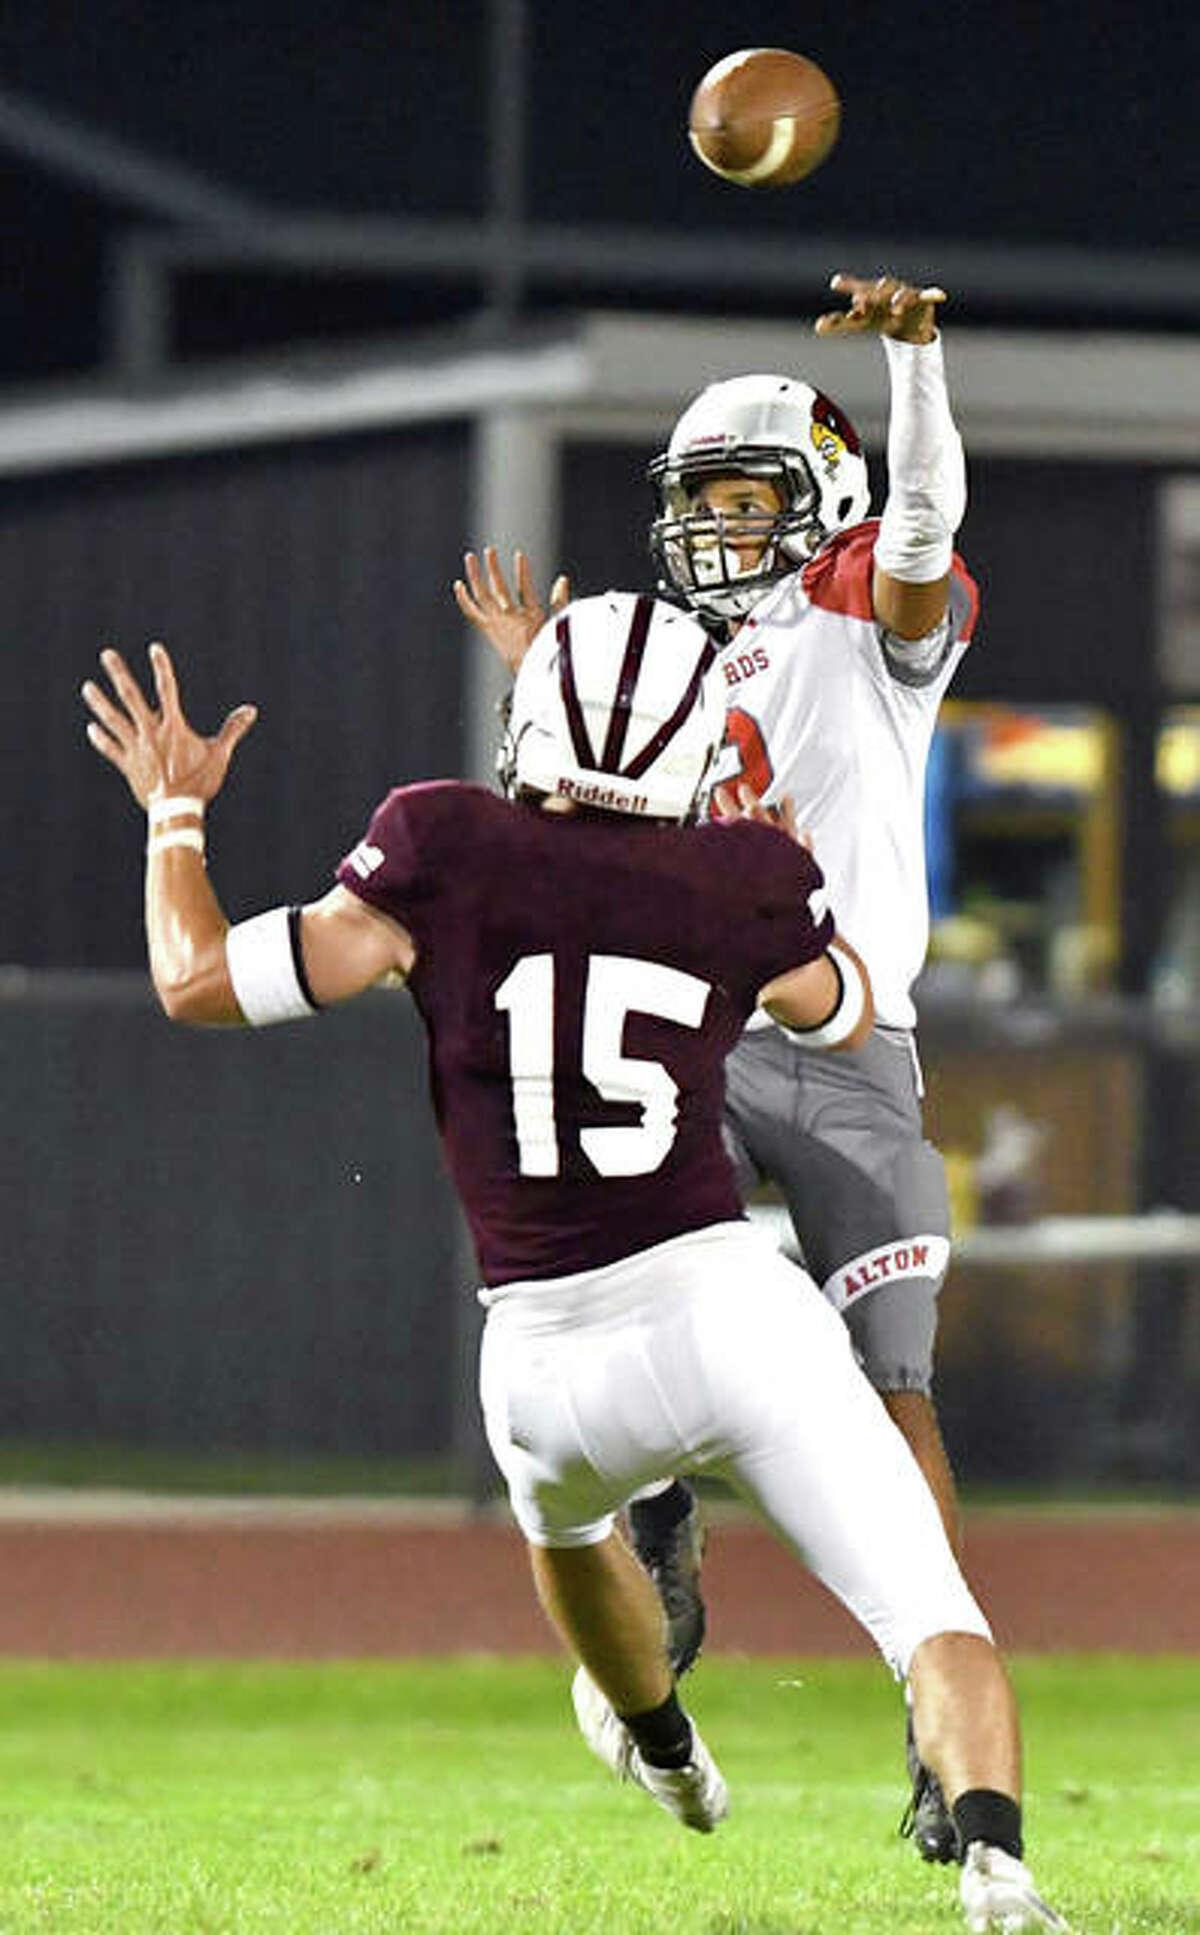 Alton quarterback Andrew Jones passes the ball over Moline's Immanuel Bailey in the second quarter Friday night in Moline.